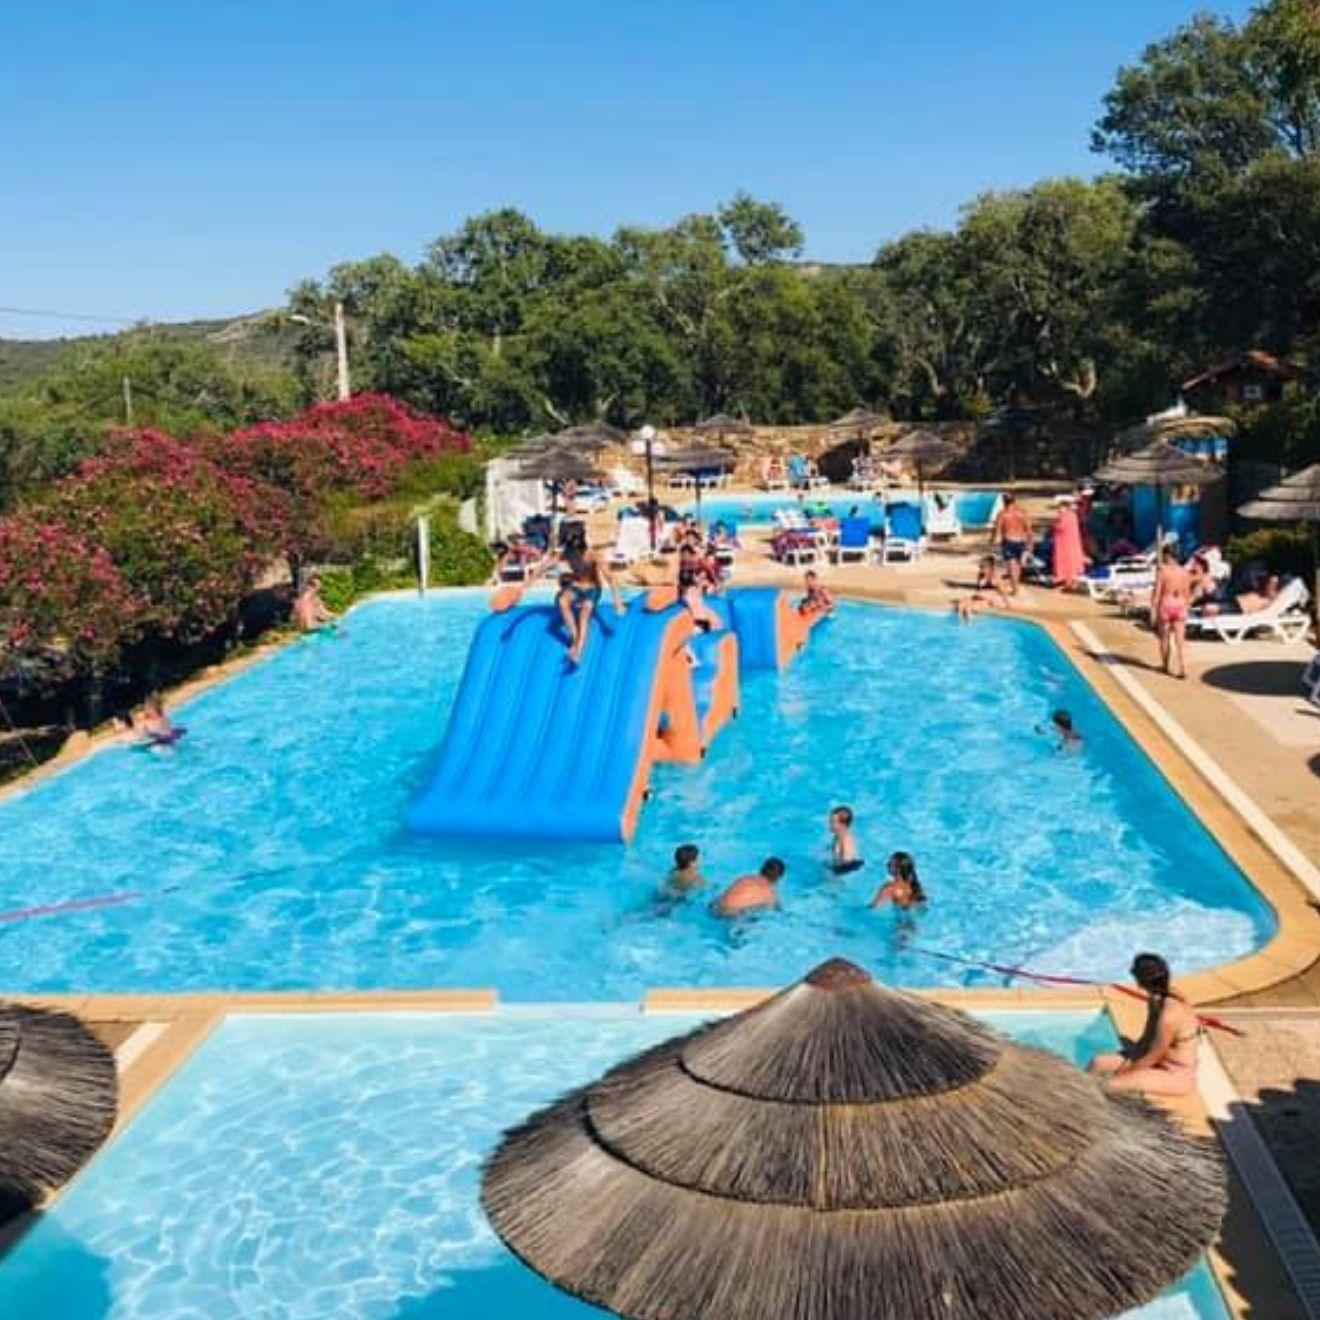 Espace Piscines Chauffées Camping Porto-Vecchio Palombaggia 3 piscine